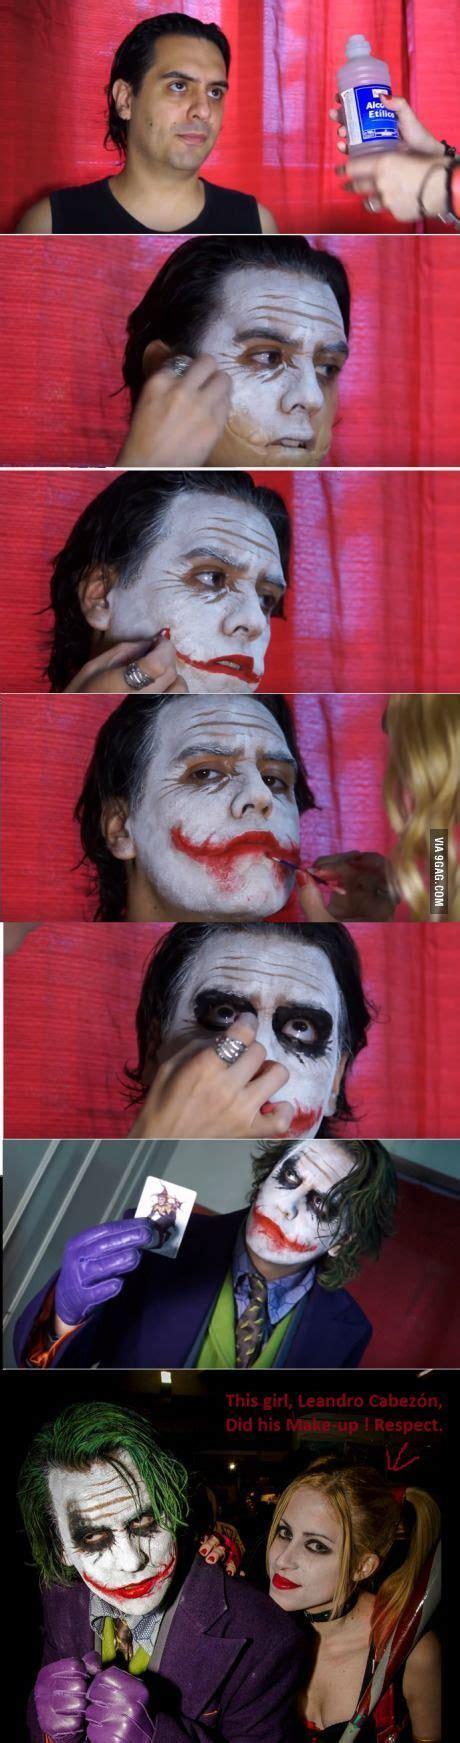 Amazing Joker Cosplay Make Up By Leandro Cabezón